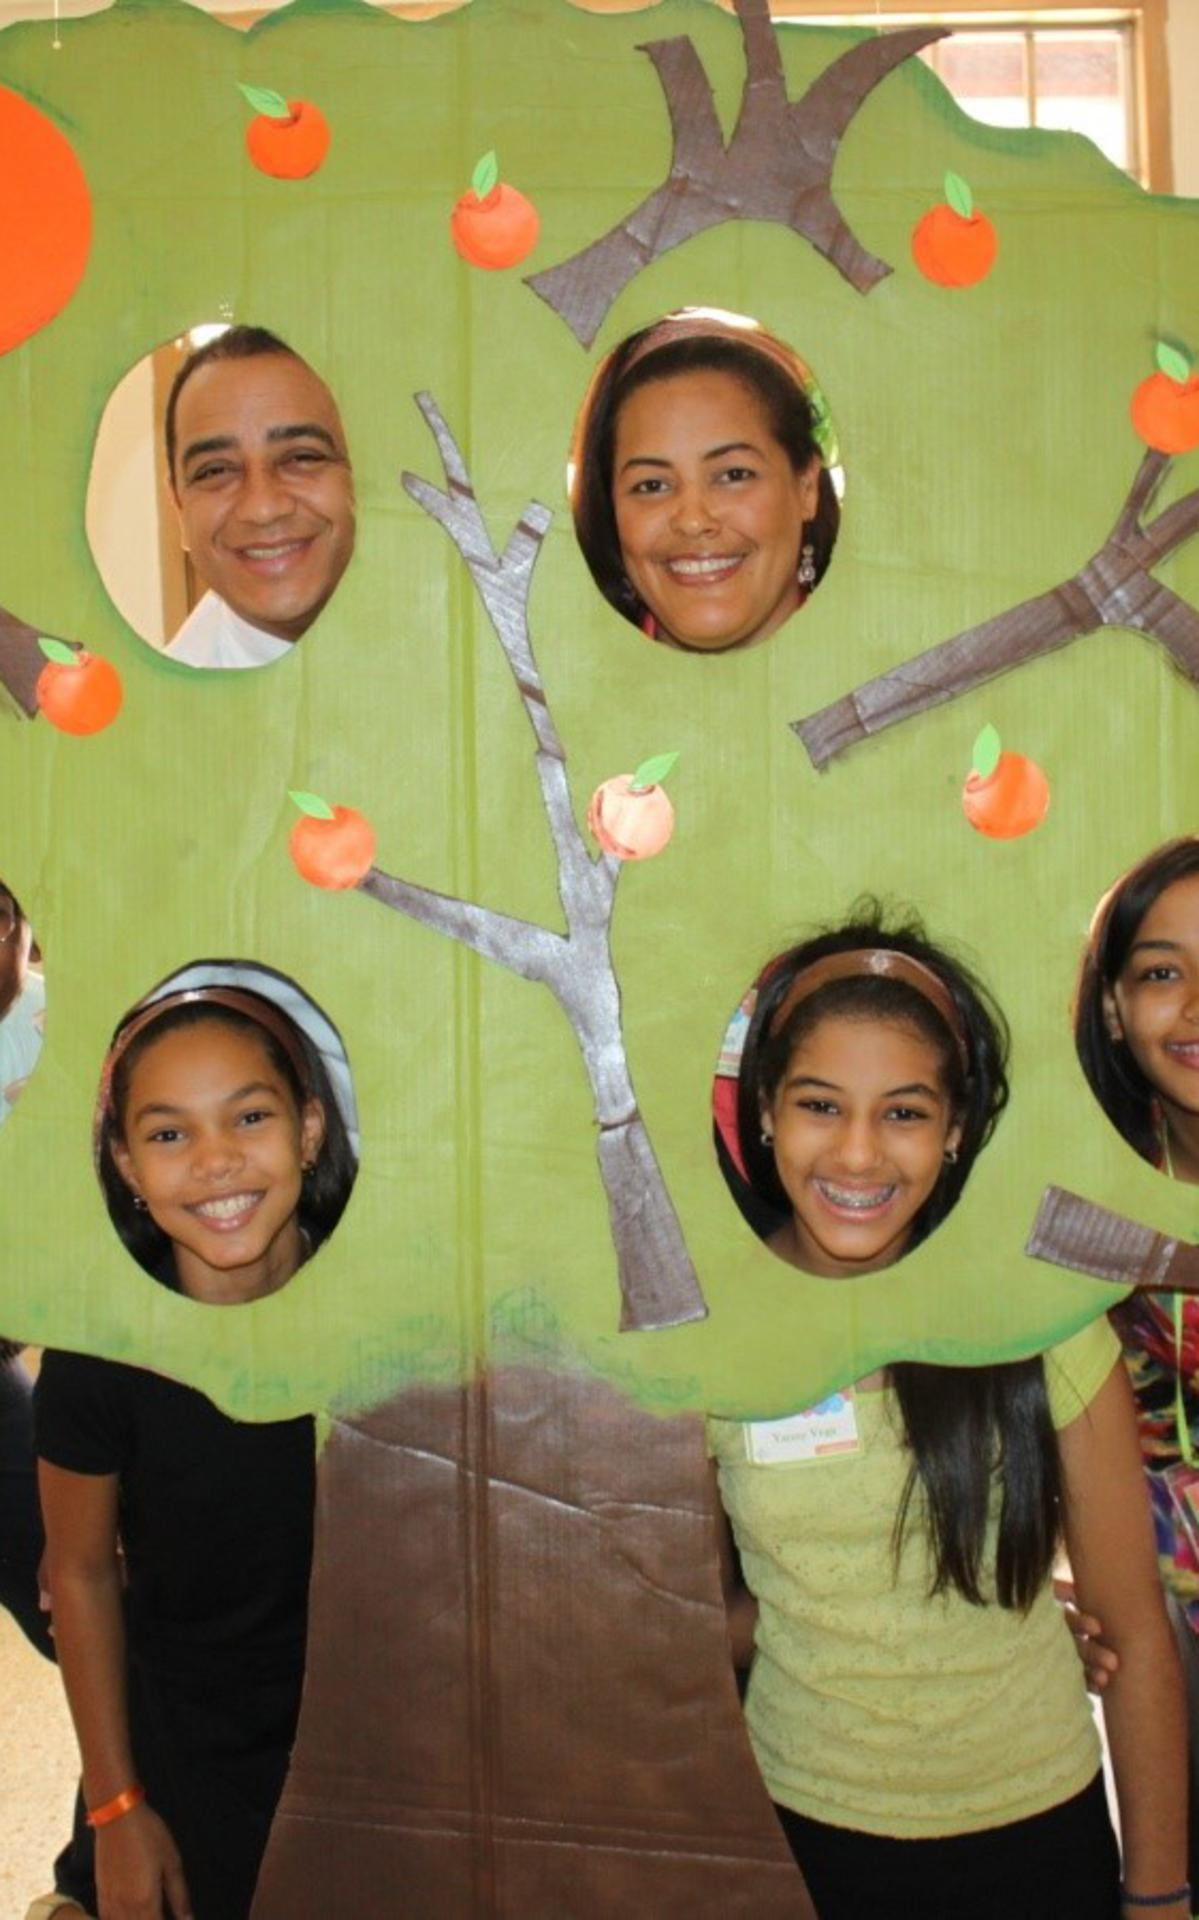 familia Vega felices.jpg